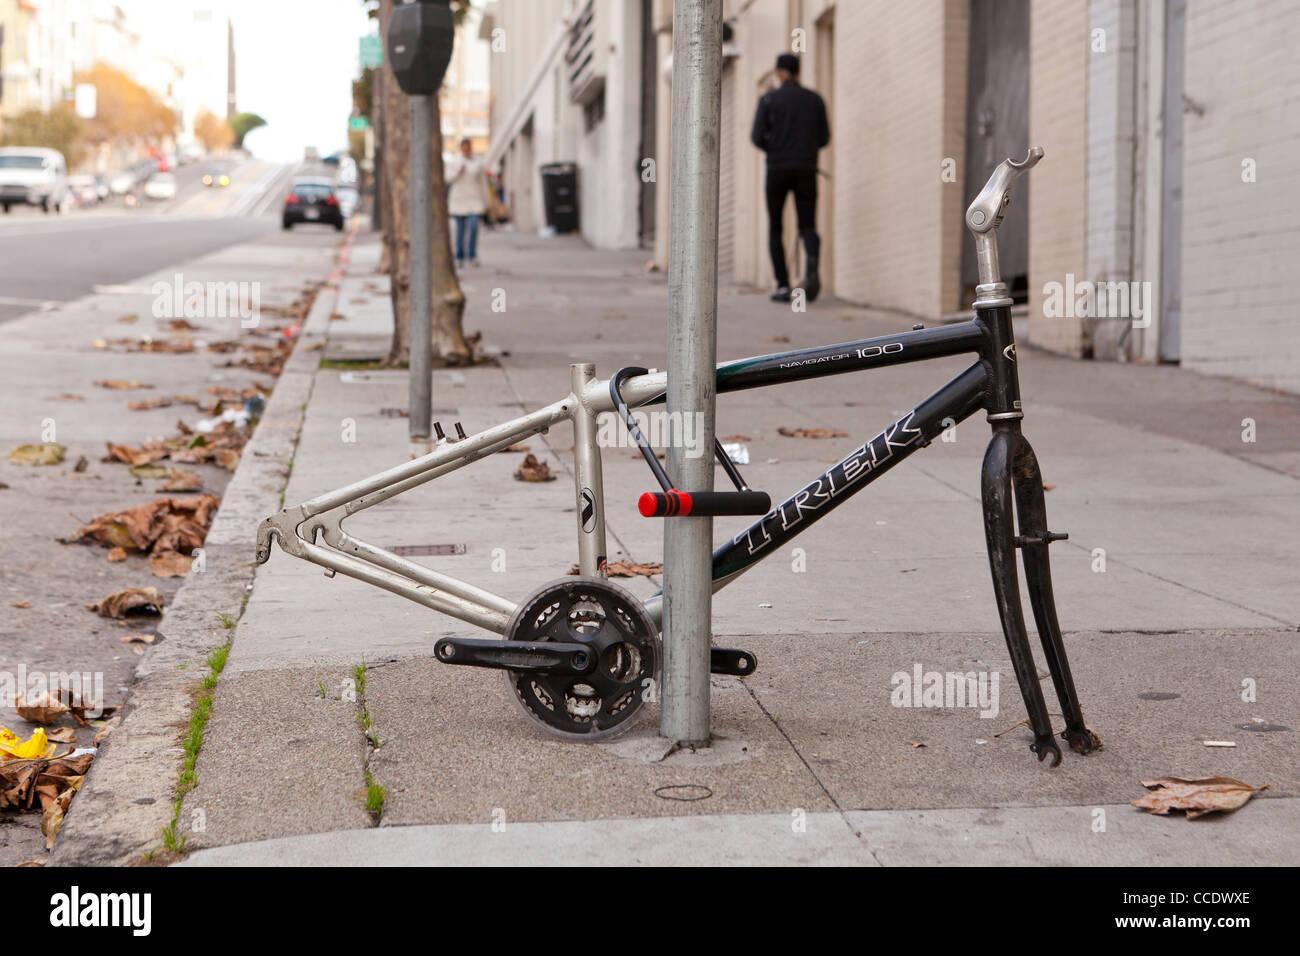 Vandalismus am Fahrrad auf dem Bürgersteig (vandalized bike Frame) - USA Stockbild